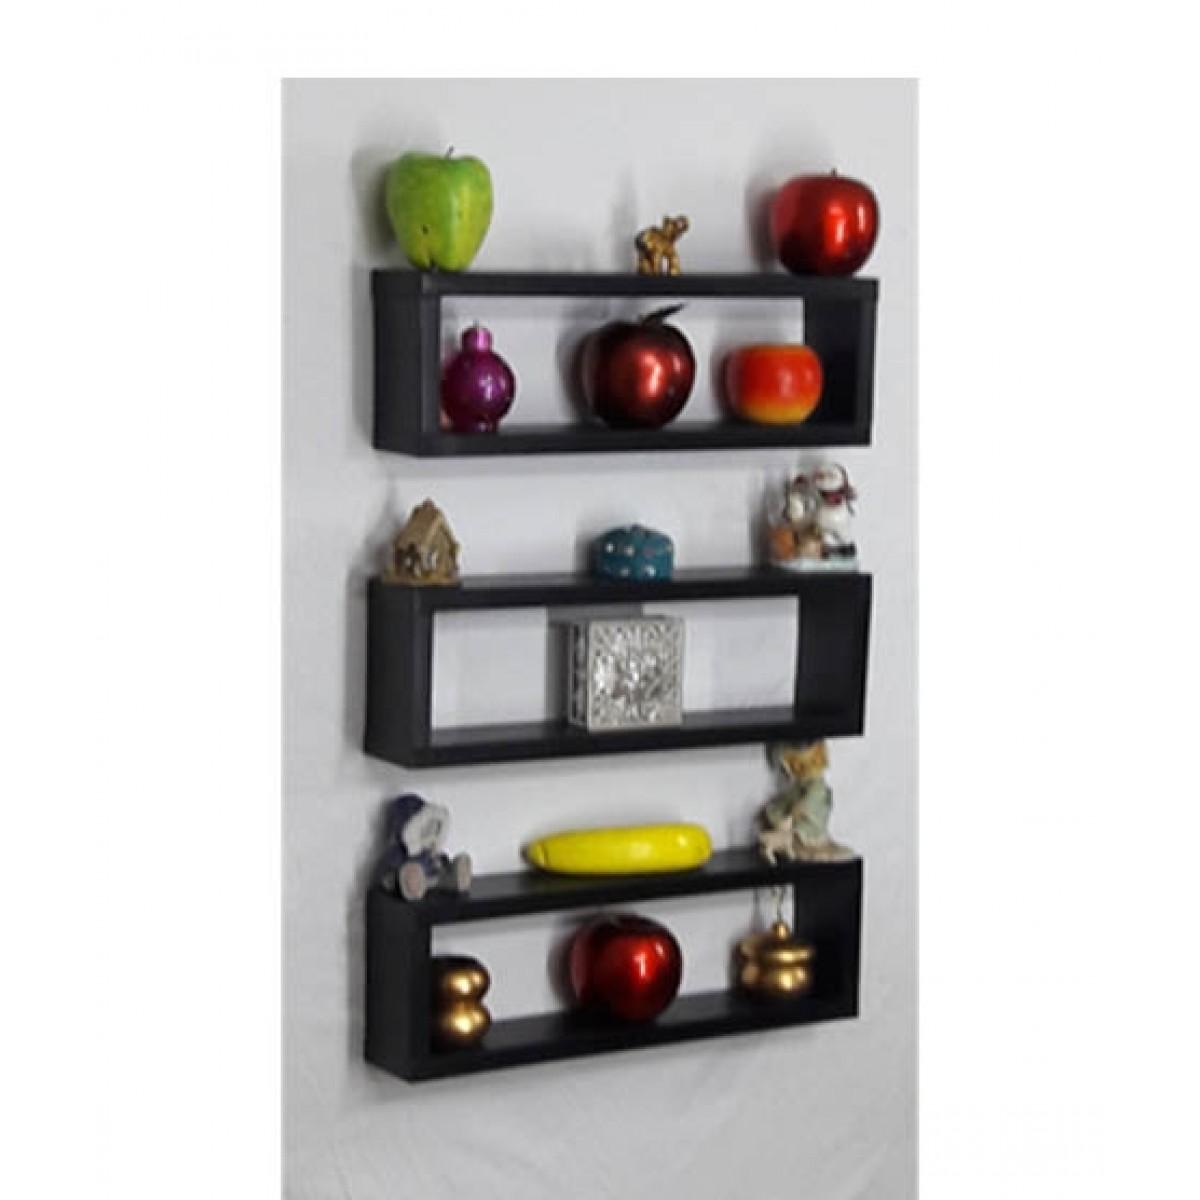 Wood World Wall Hanging Shelf Black - Pack Of 3